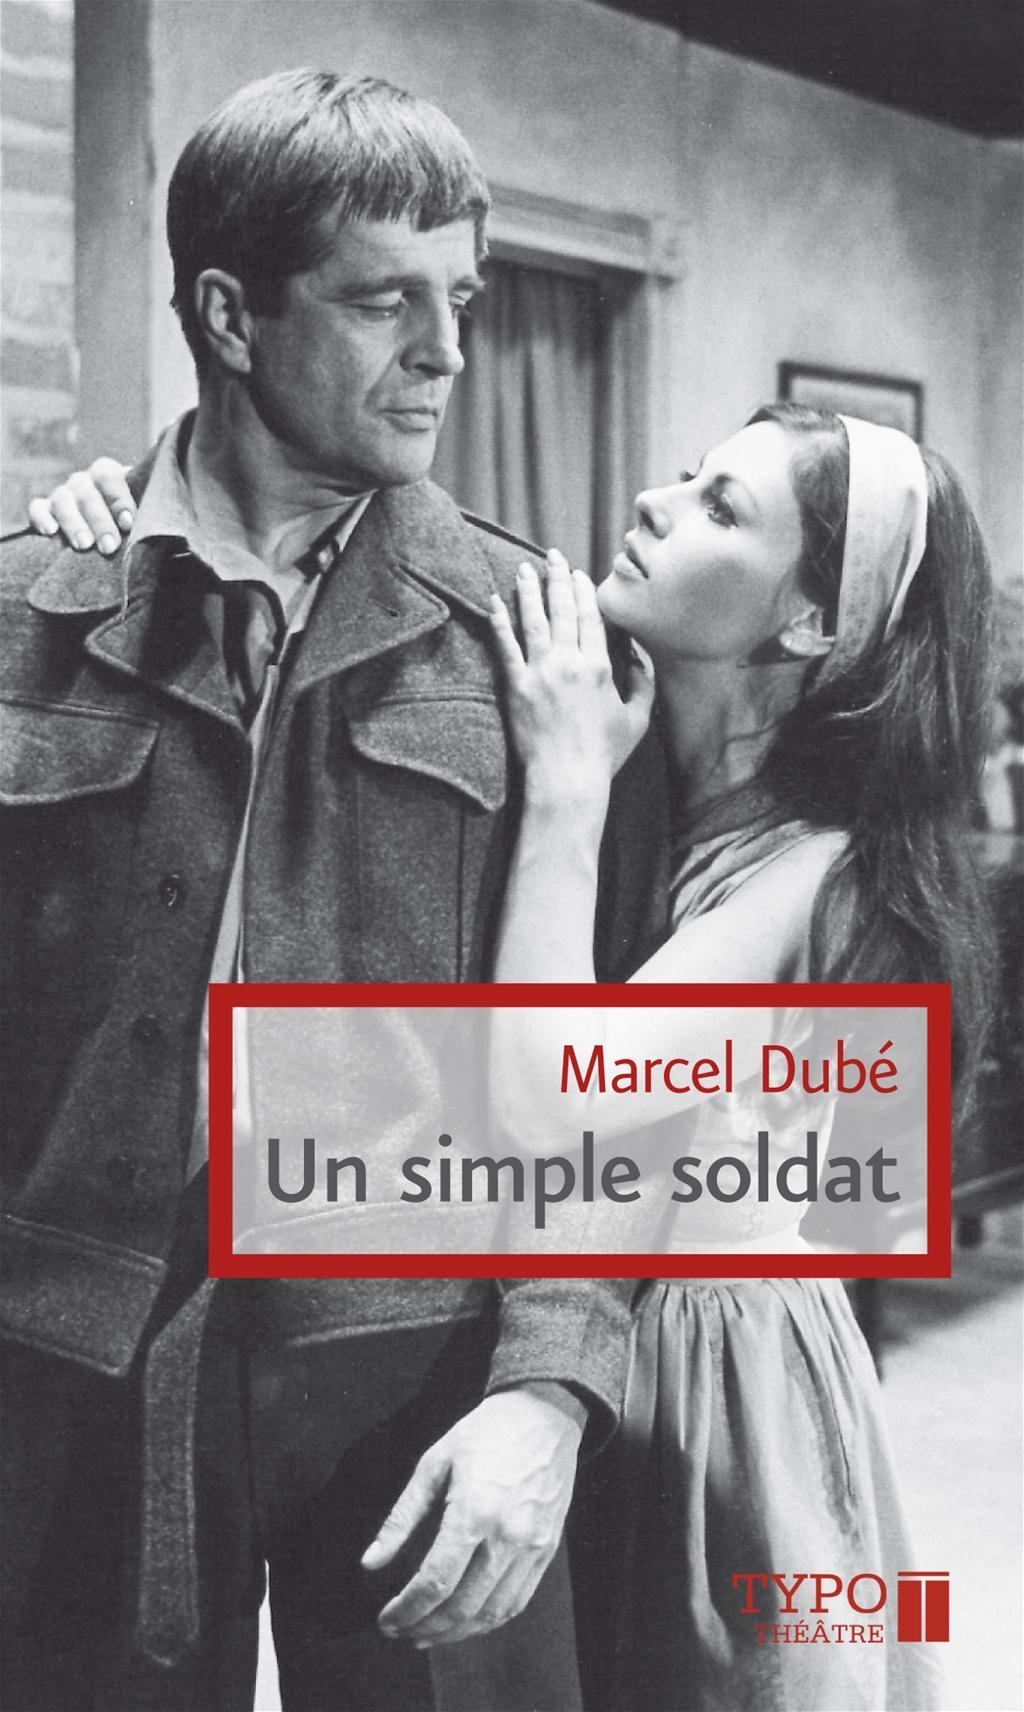 florence marcel dubé dissertation